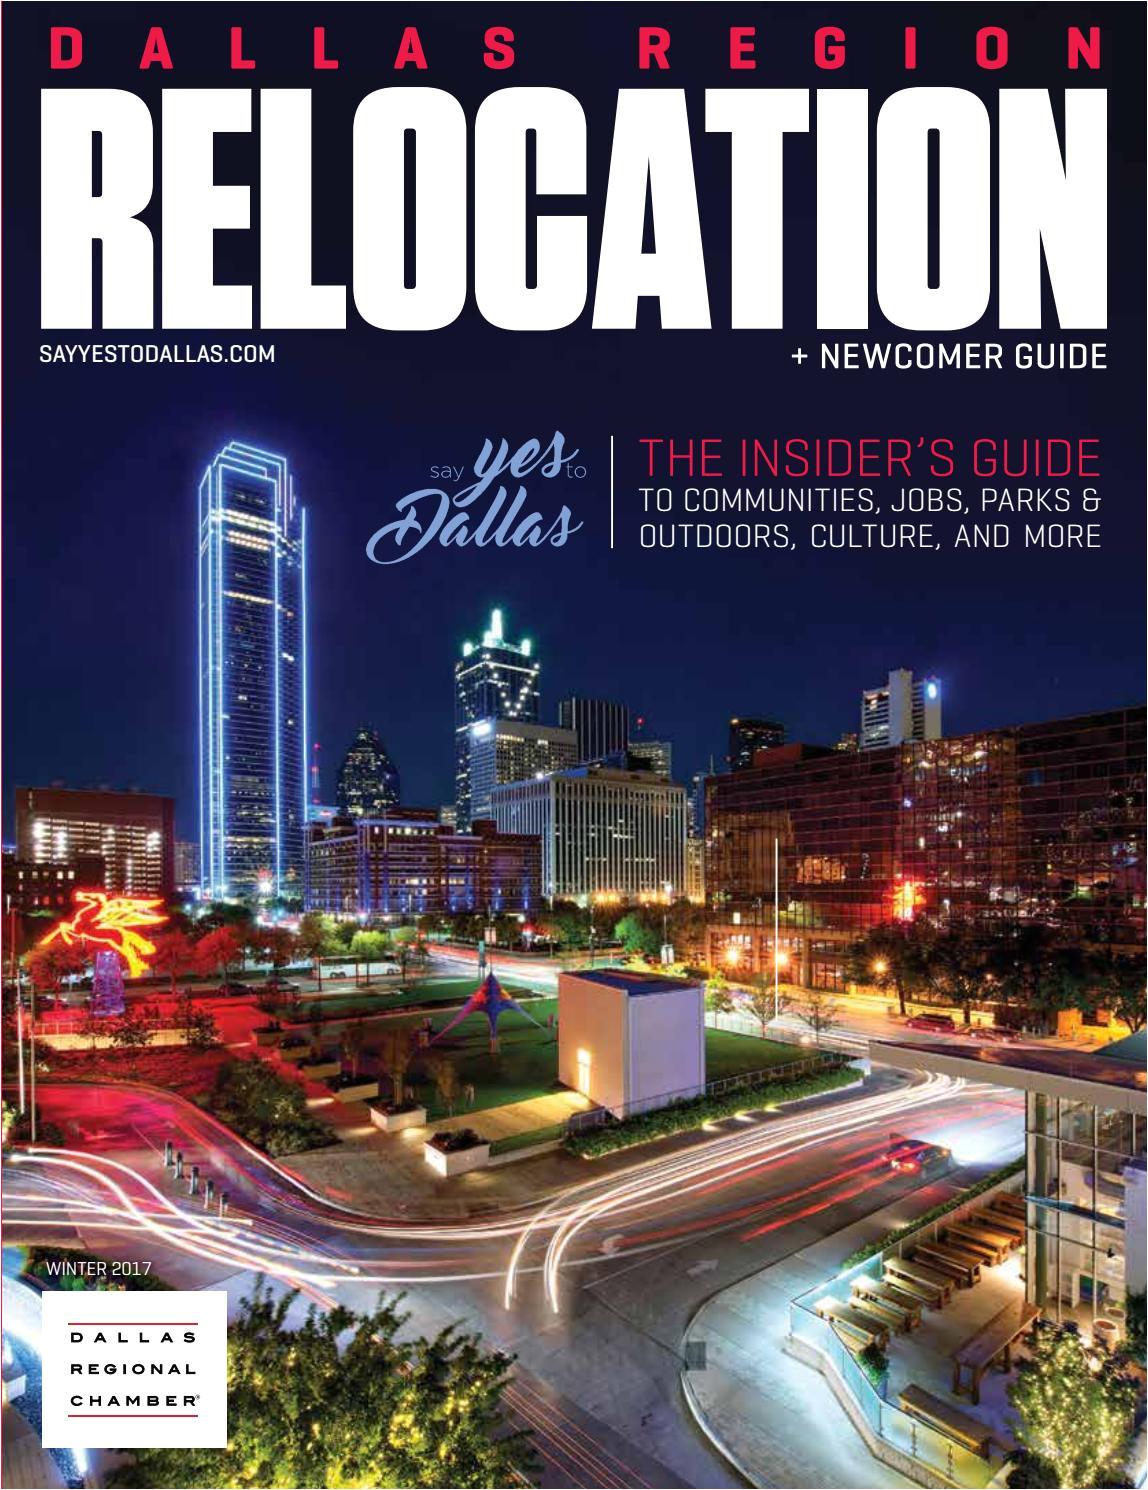 dallas region relocation newcomer guide winter 2017 by dallas regional chamber publications issuu